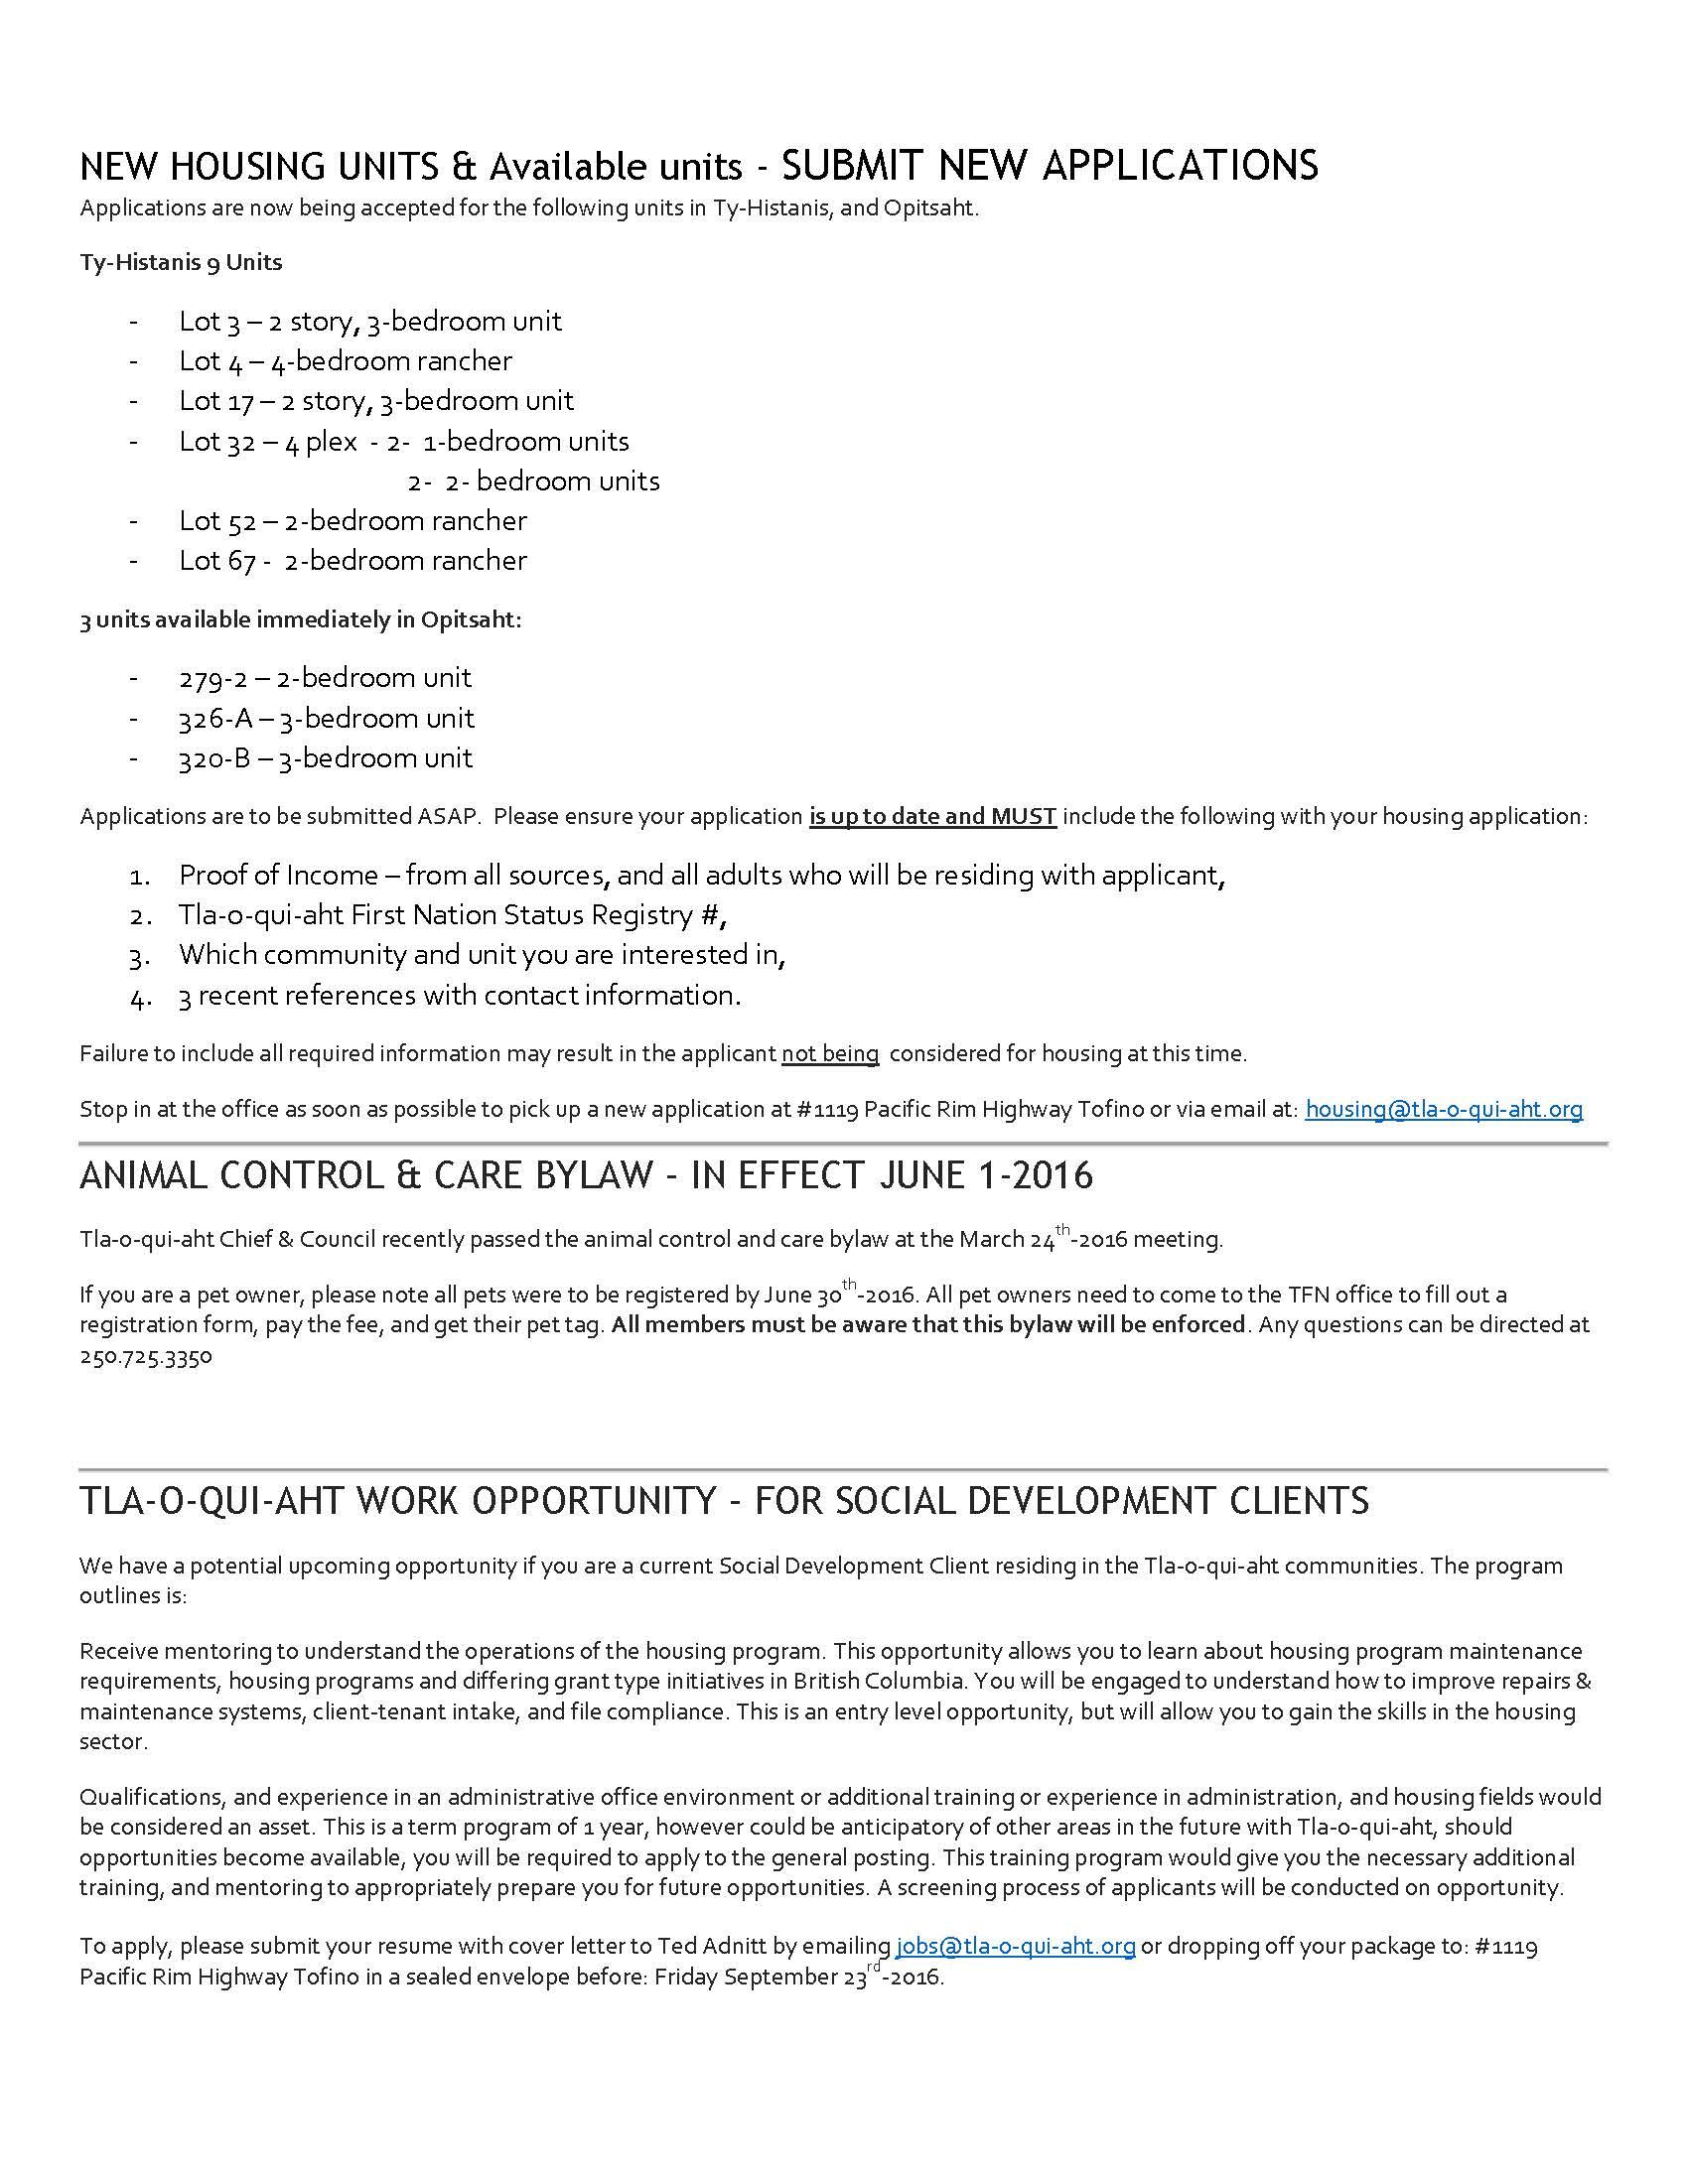 TFN Bulletin Sept 1-2016_Page_18.jpg